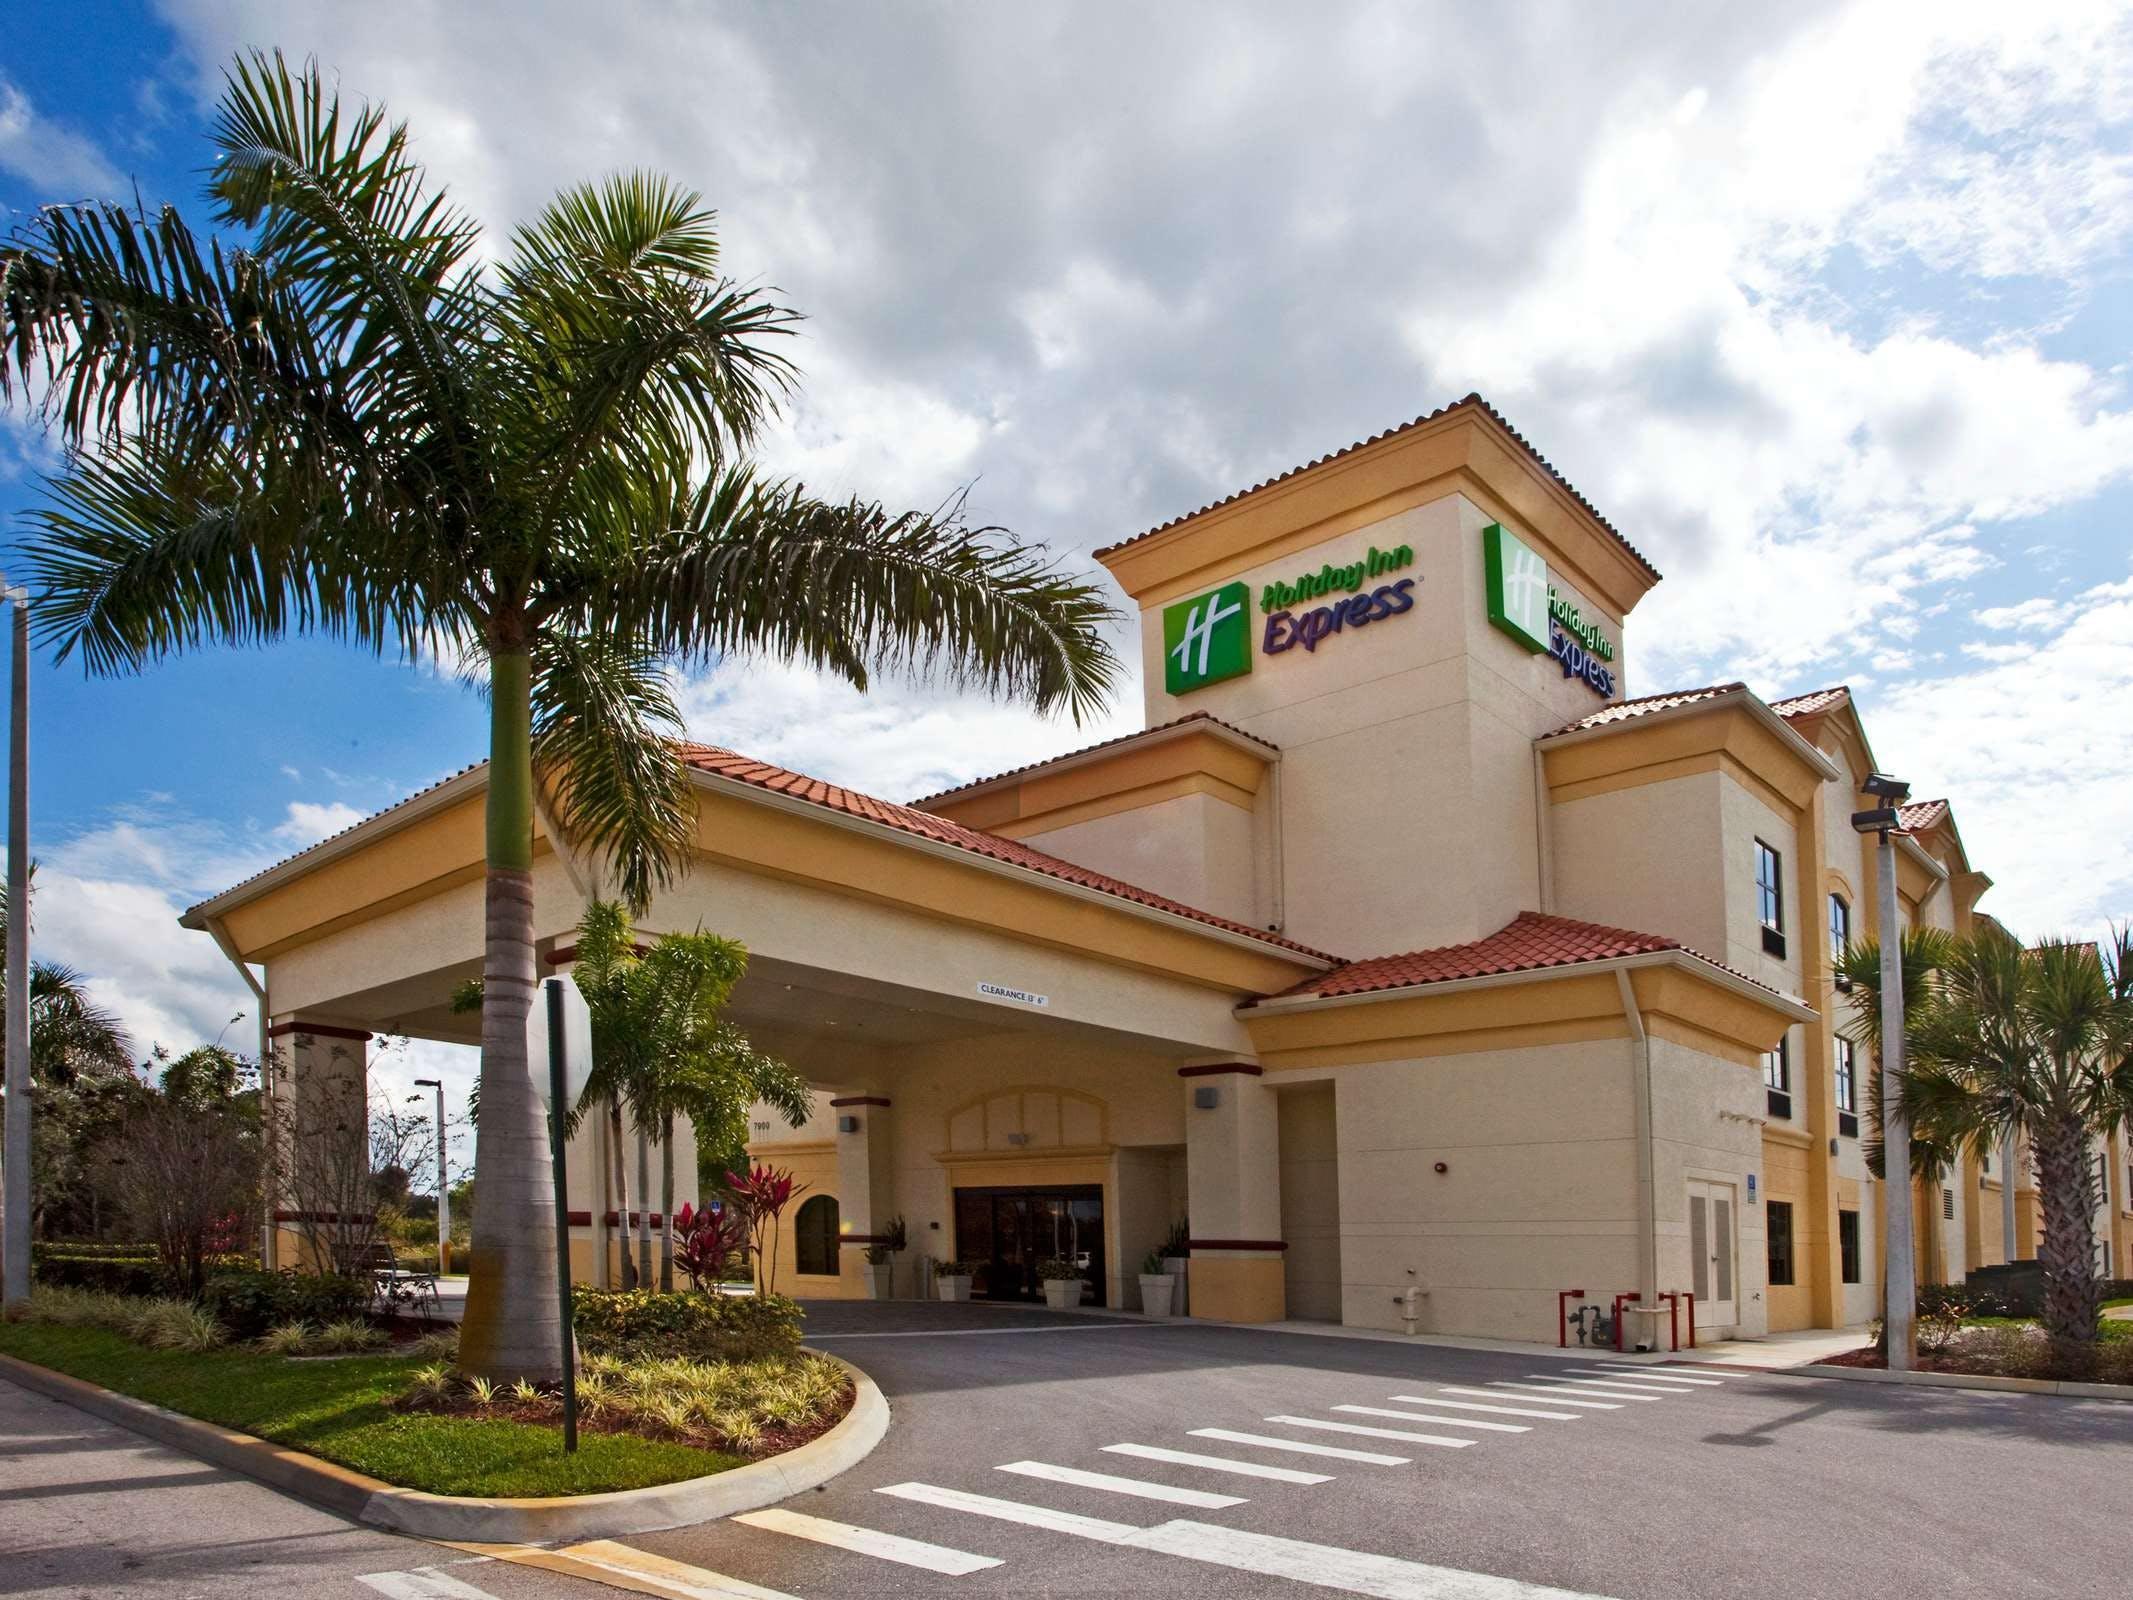 Last Minute Hotel Deals in Vero Beach - HotelTonight